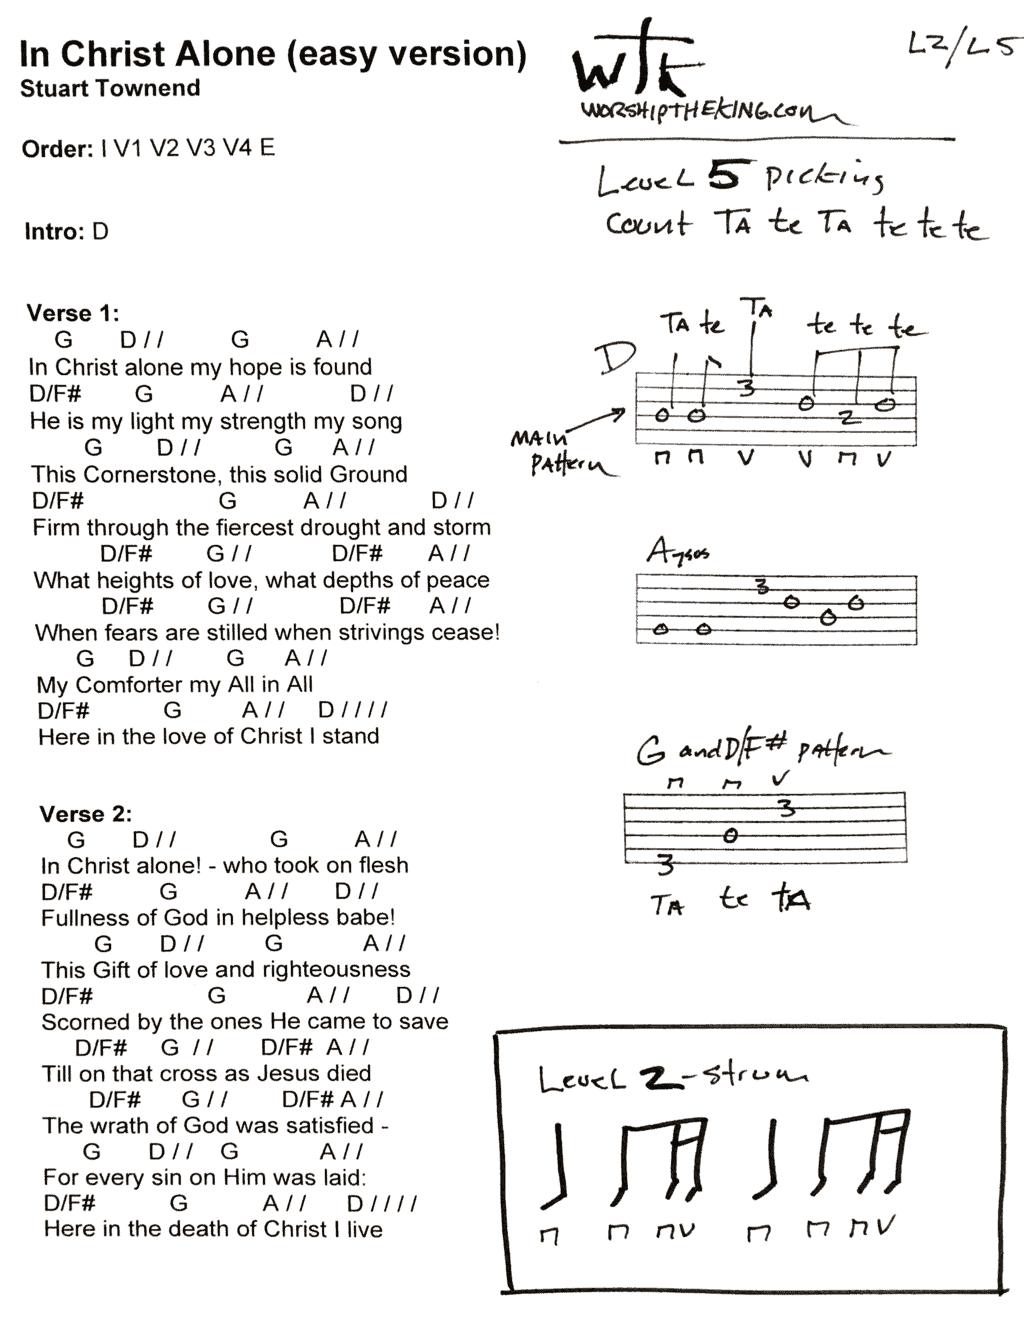 inchristalone-chart1